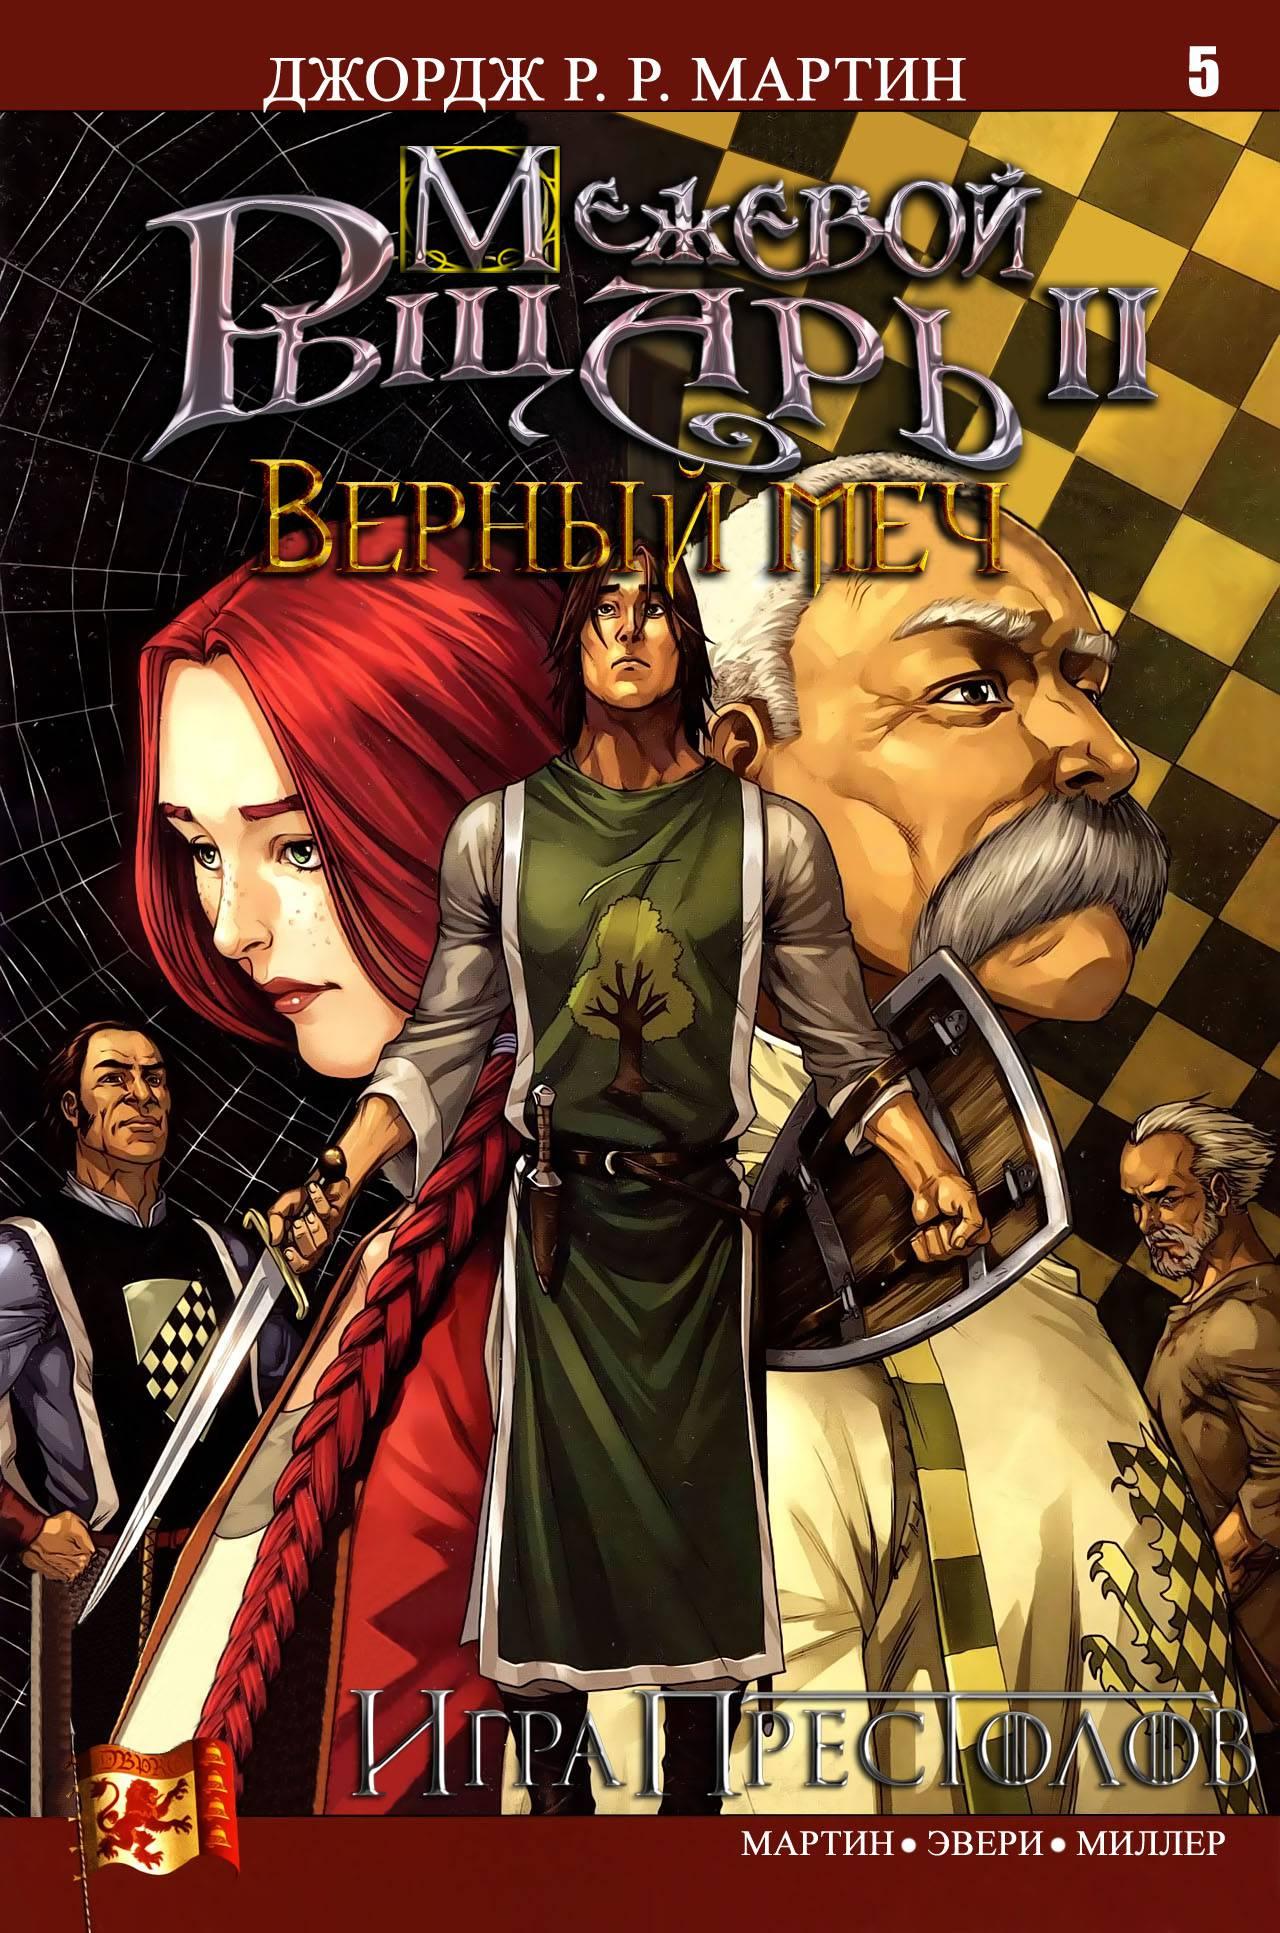 Межевой Рыцарь II: Верный Меч №5 онлайн